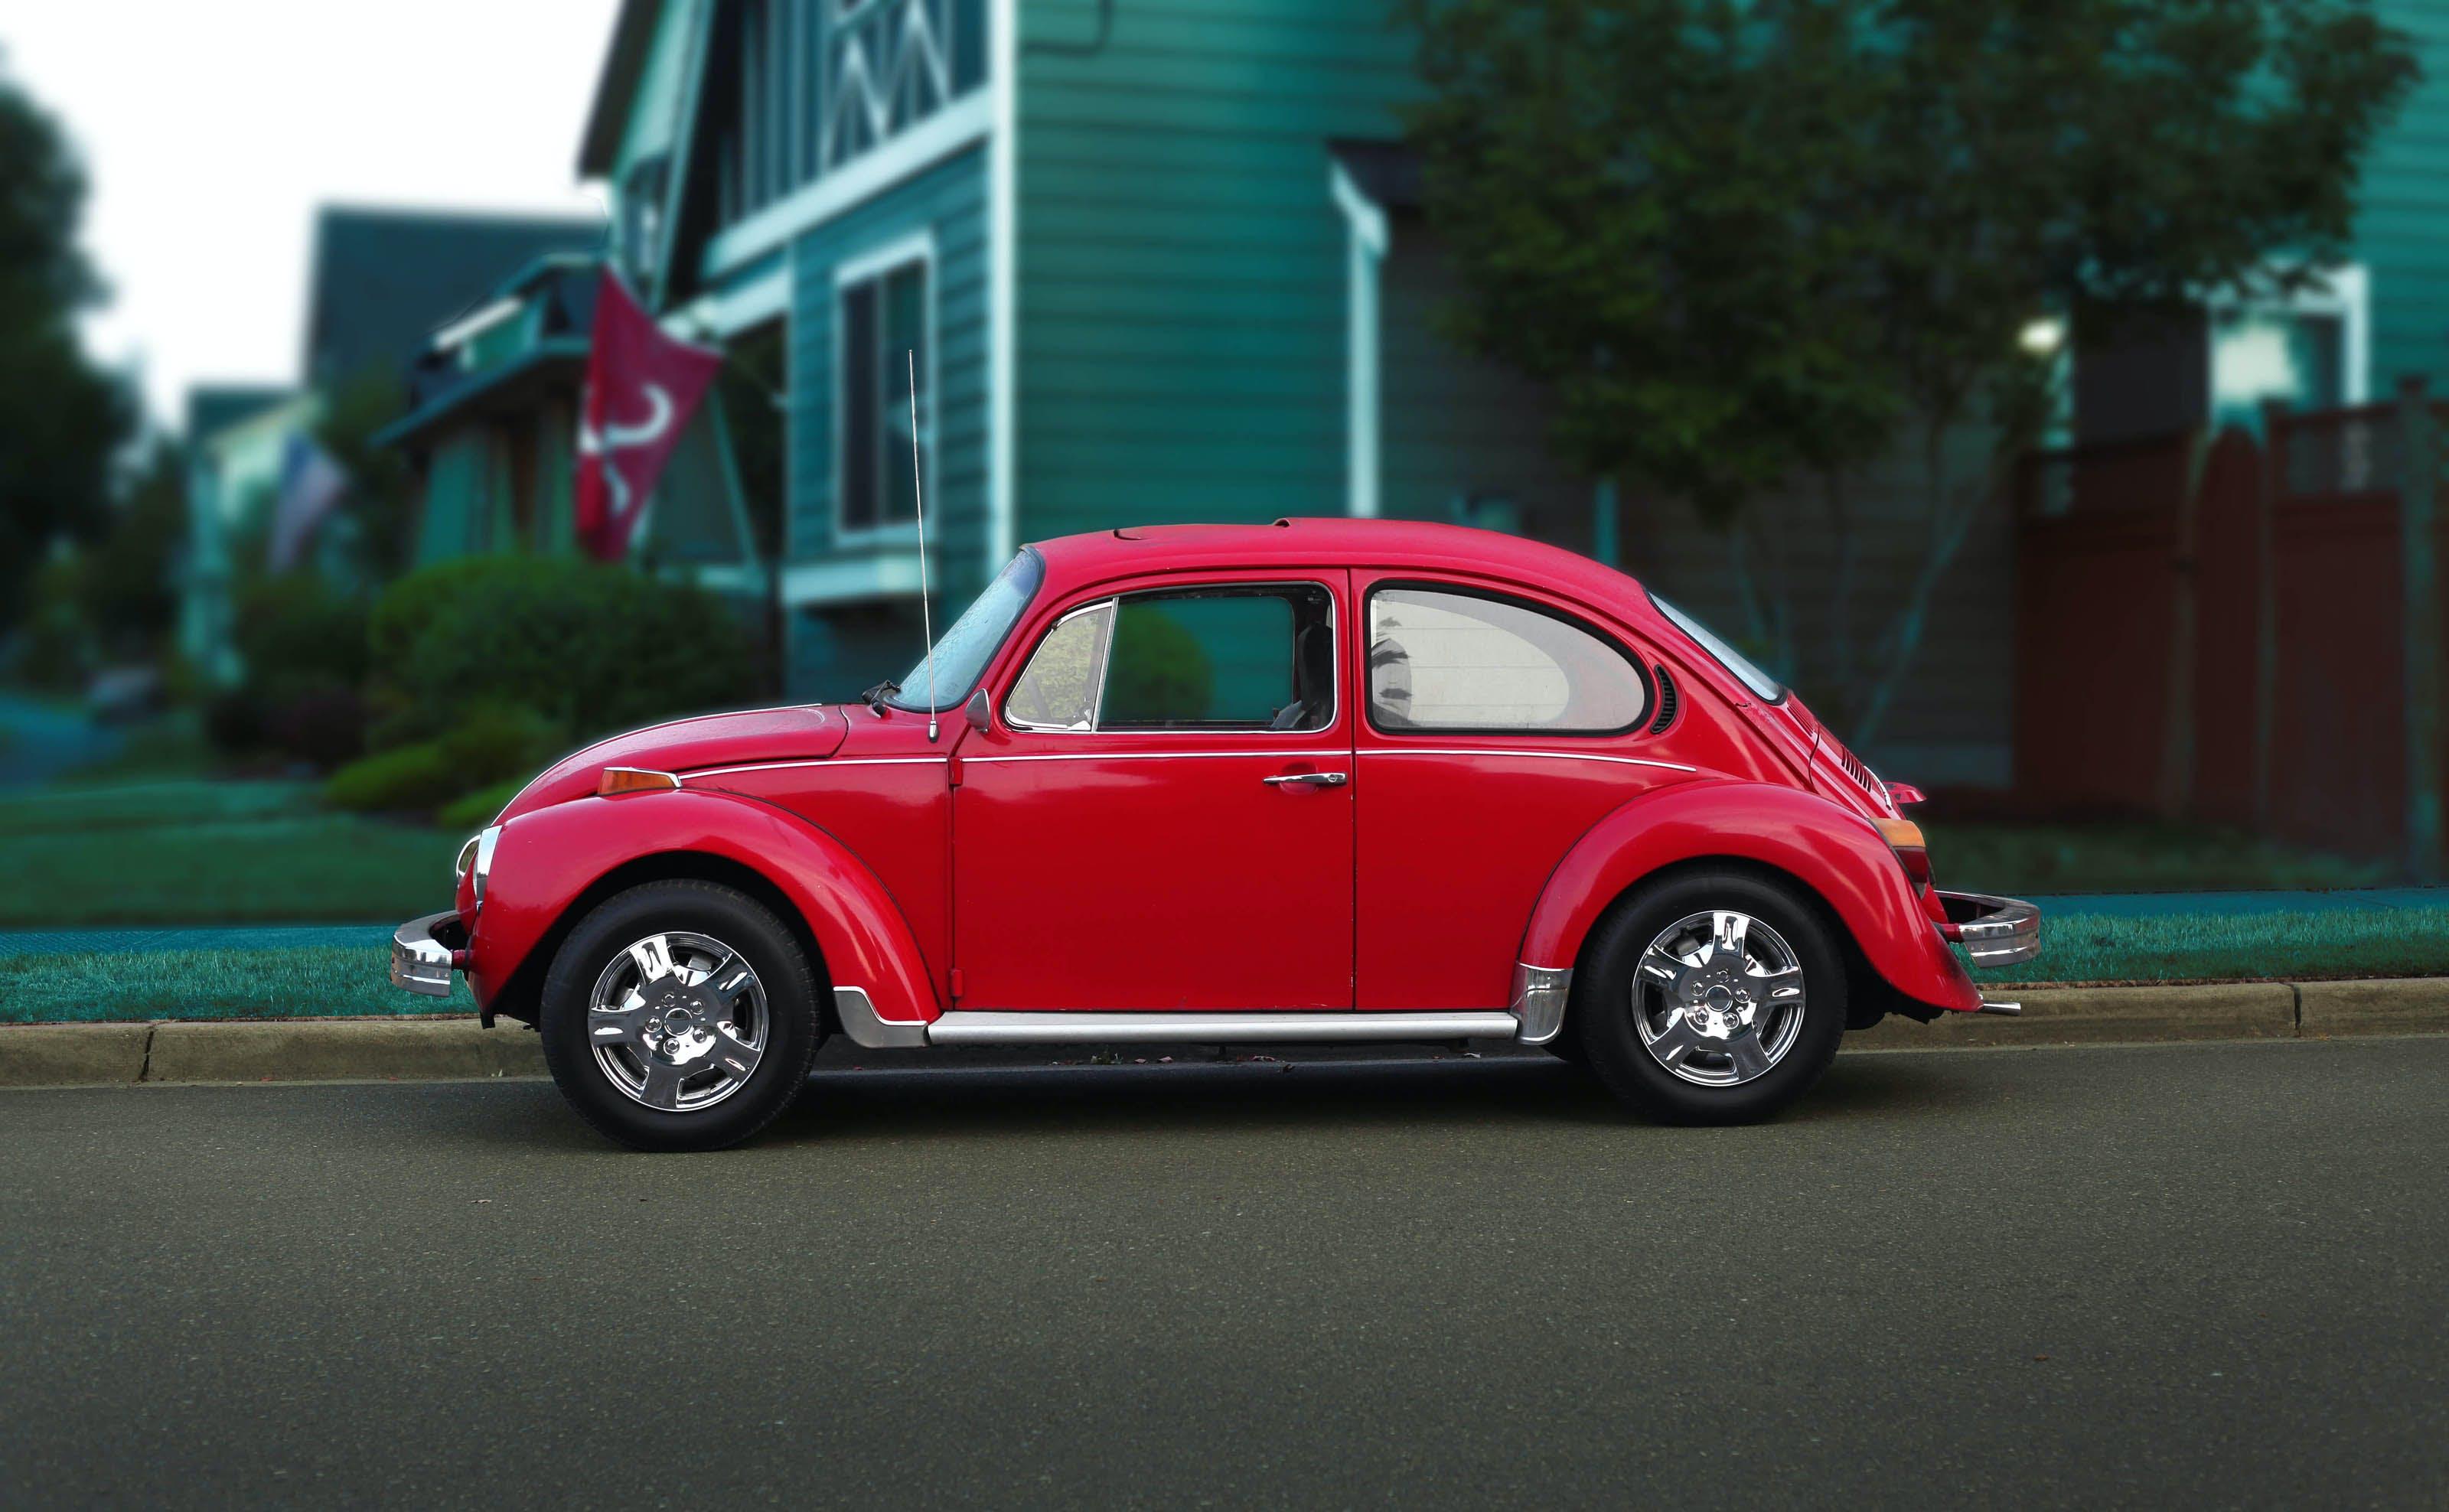 Fotos de stock gratuitas de asfalto, automotor, automóvil, Beetle